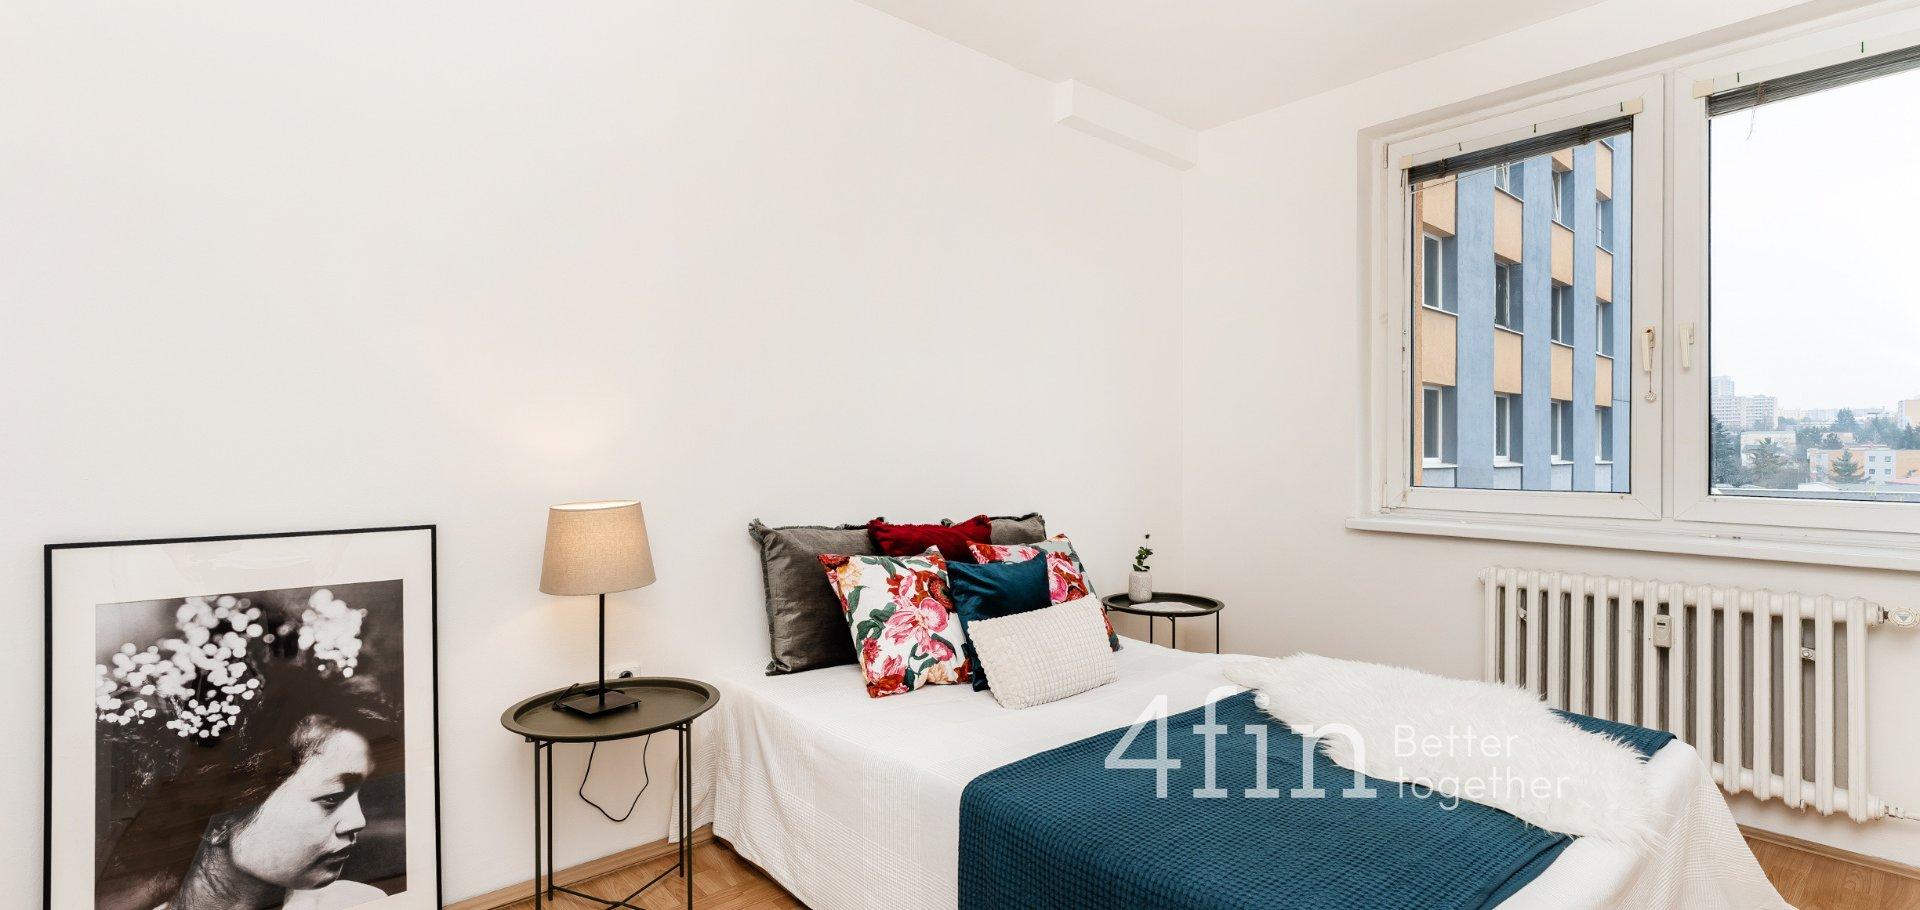 Pronájem bytu 2+kk, 40m² - Praha - Krč